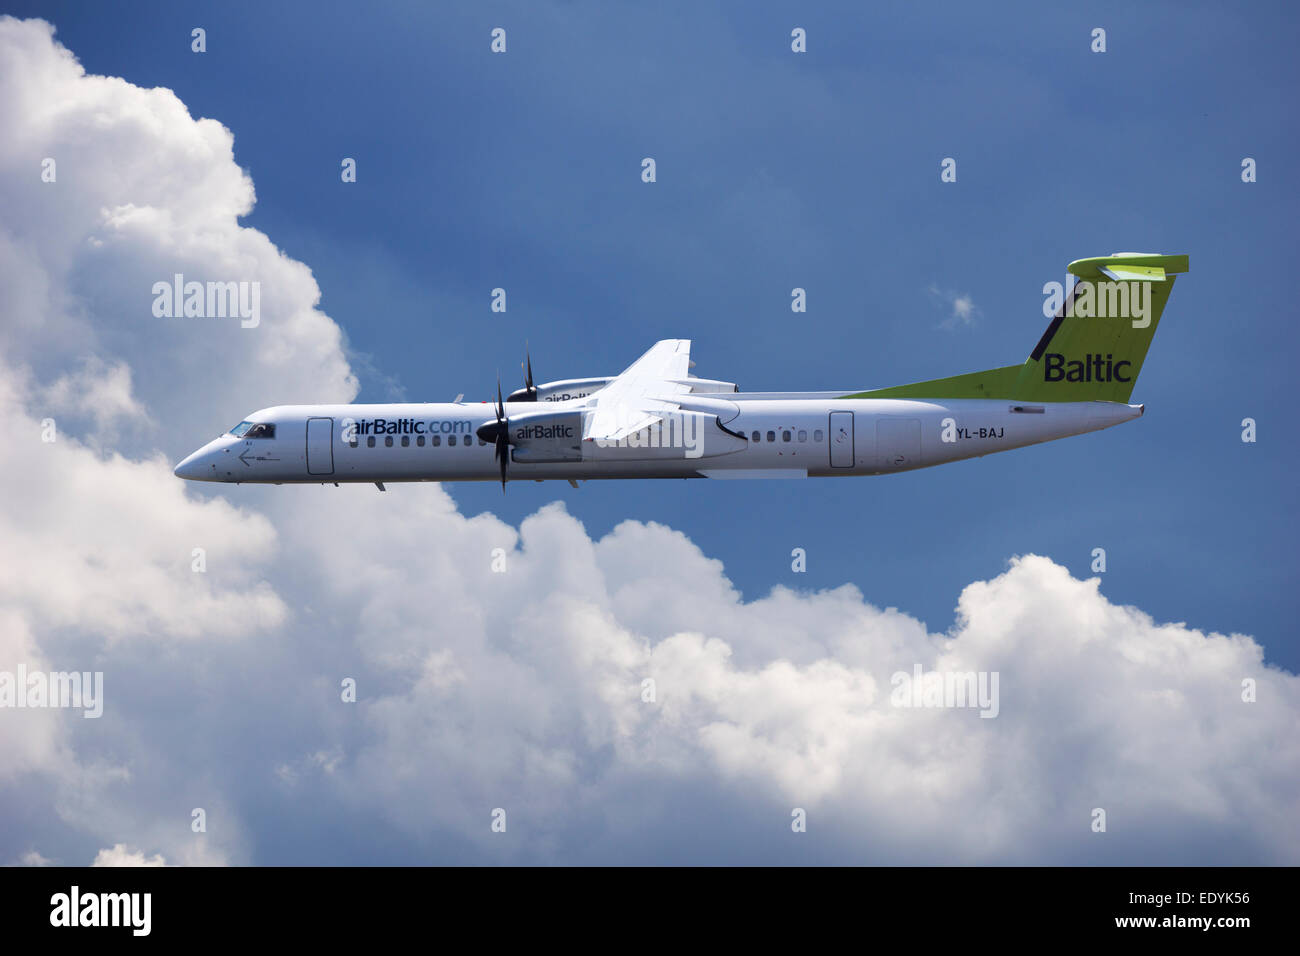 Aircraft YL-BAJ Air Baltic De Havilland Dash 8 in flight - Stock Image